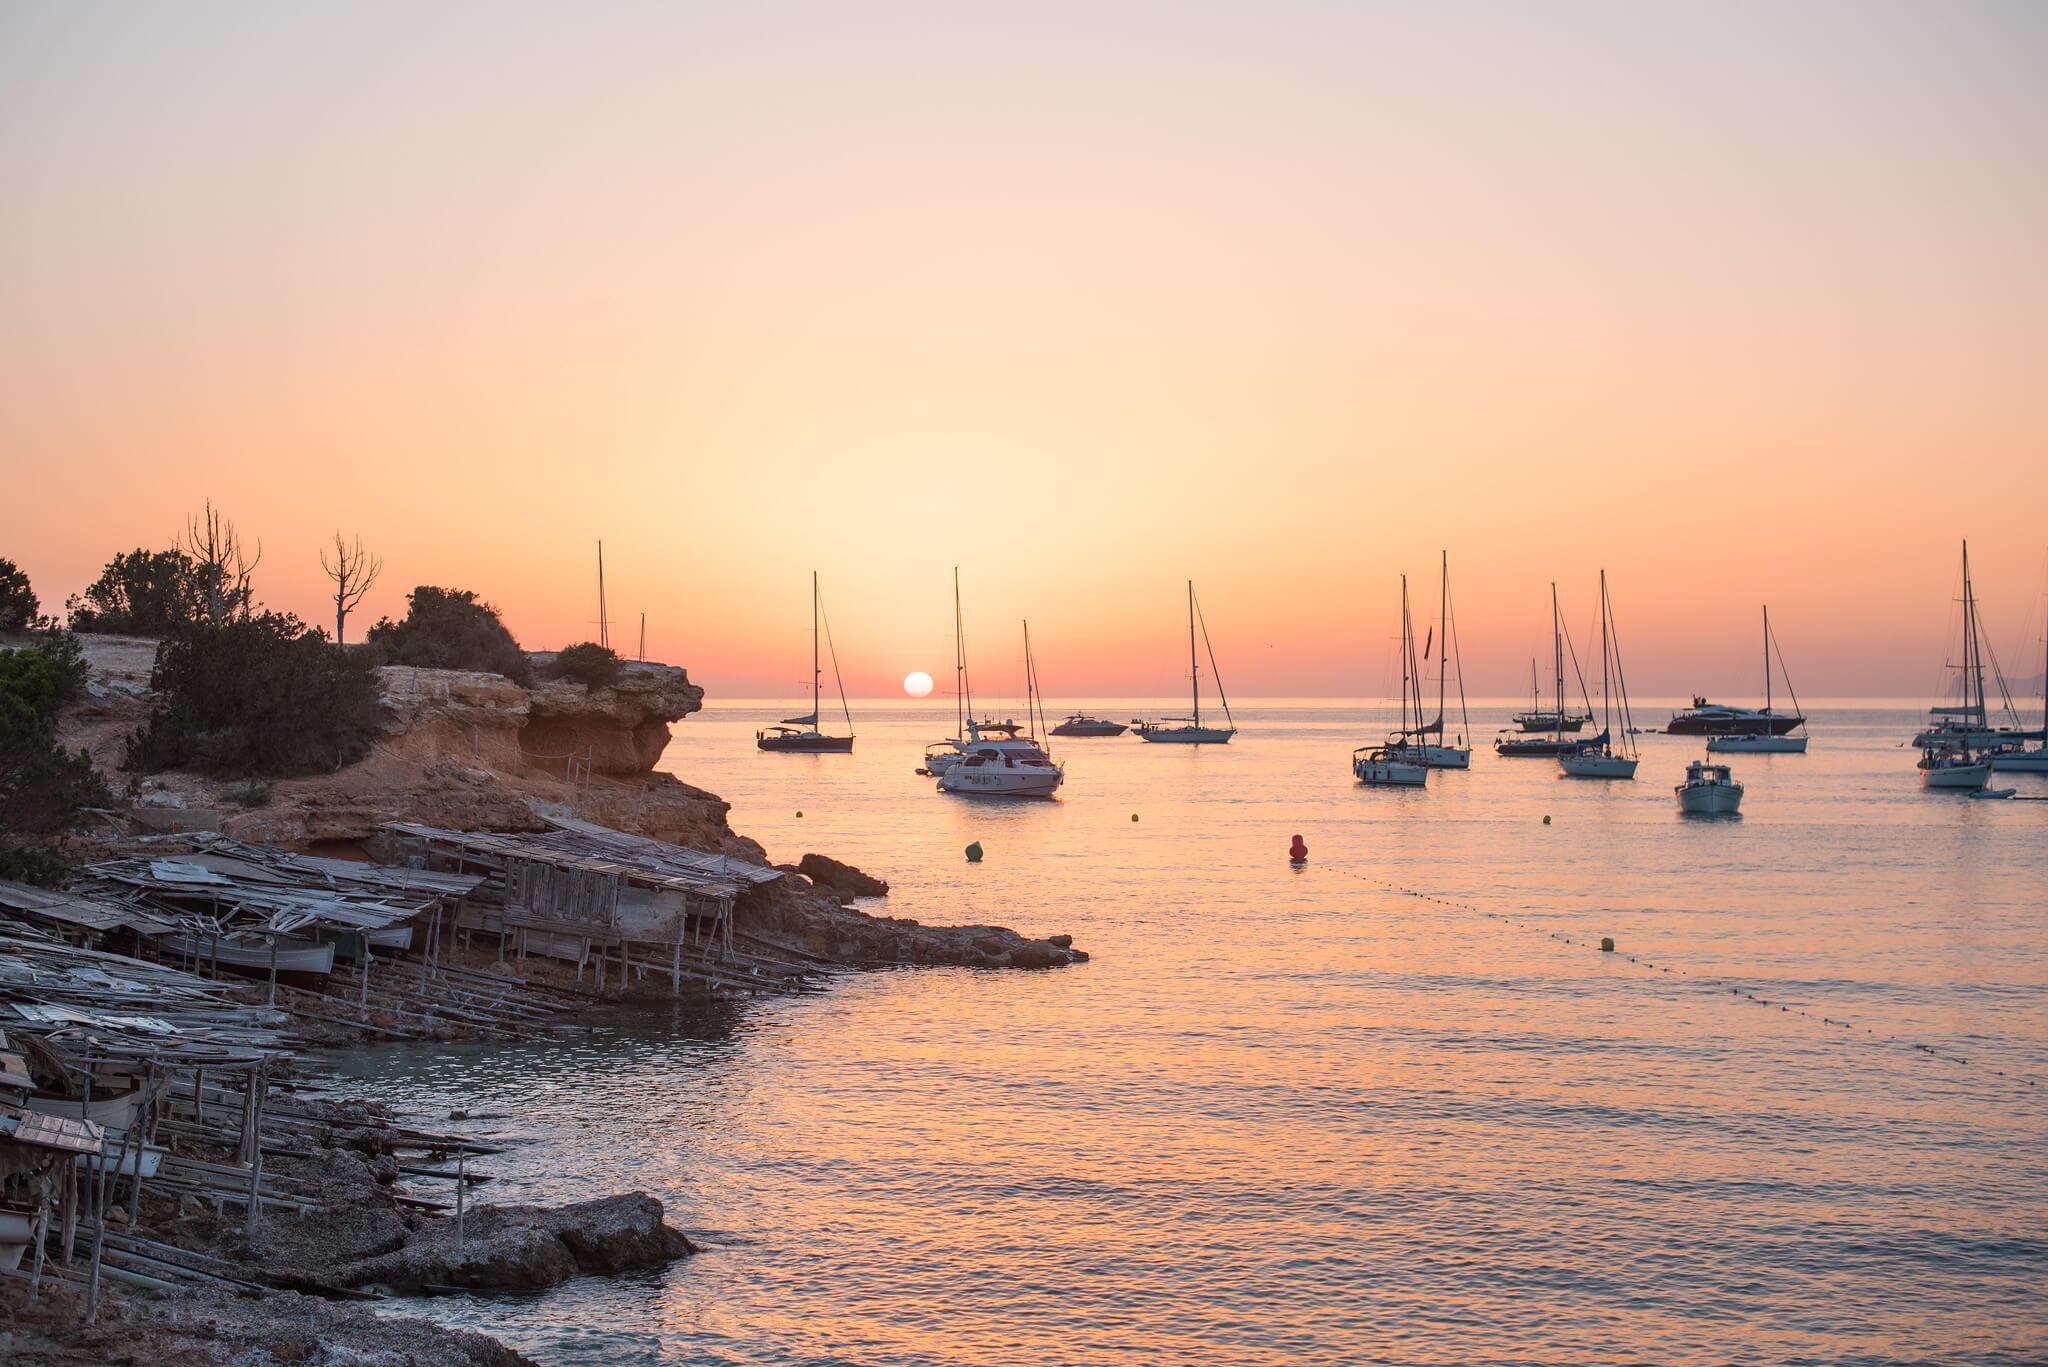 https://www.white-ibiza.com/wp-content/uploads/2020/03/formentera-sunsets-2020-03.jpg